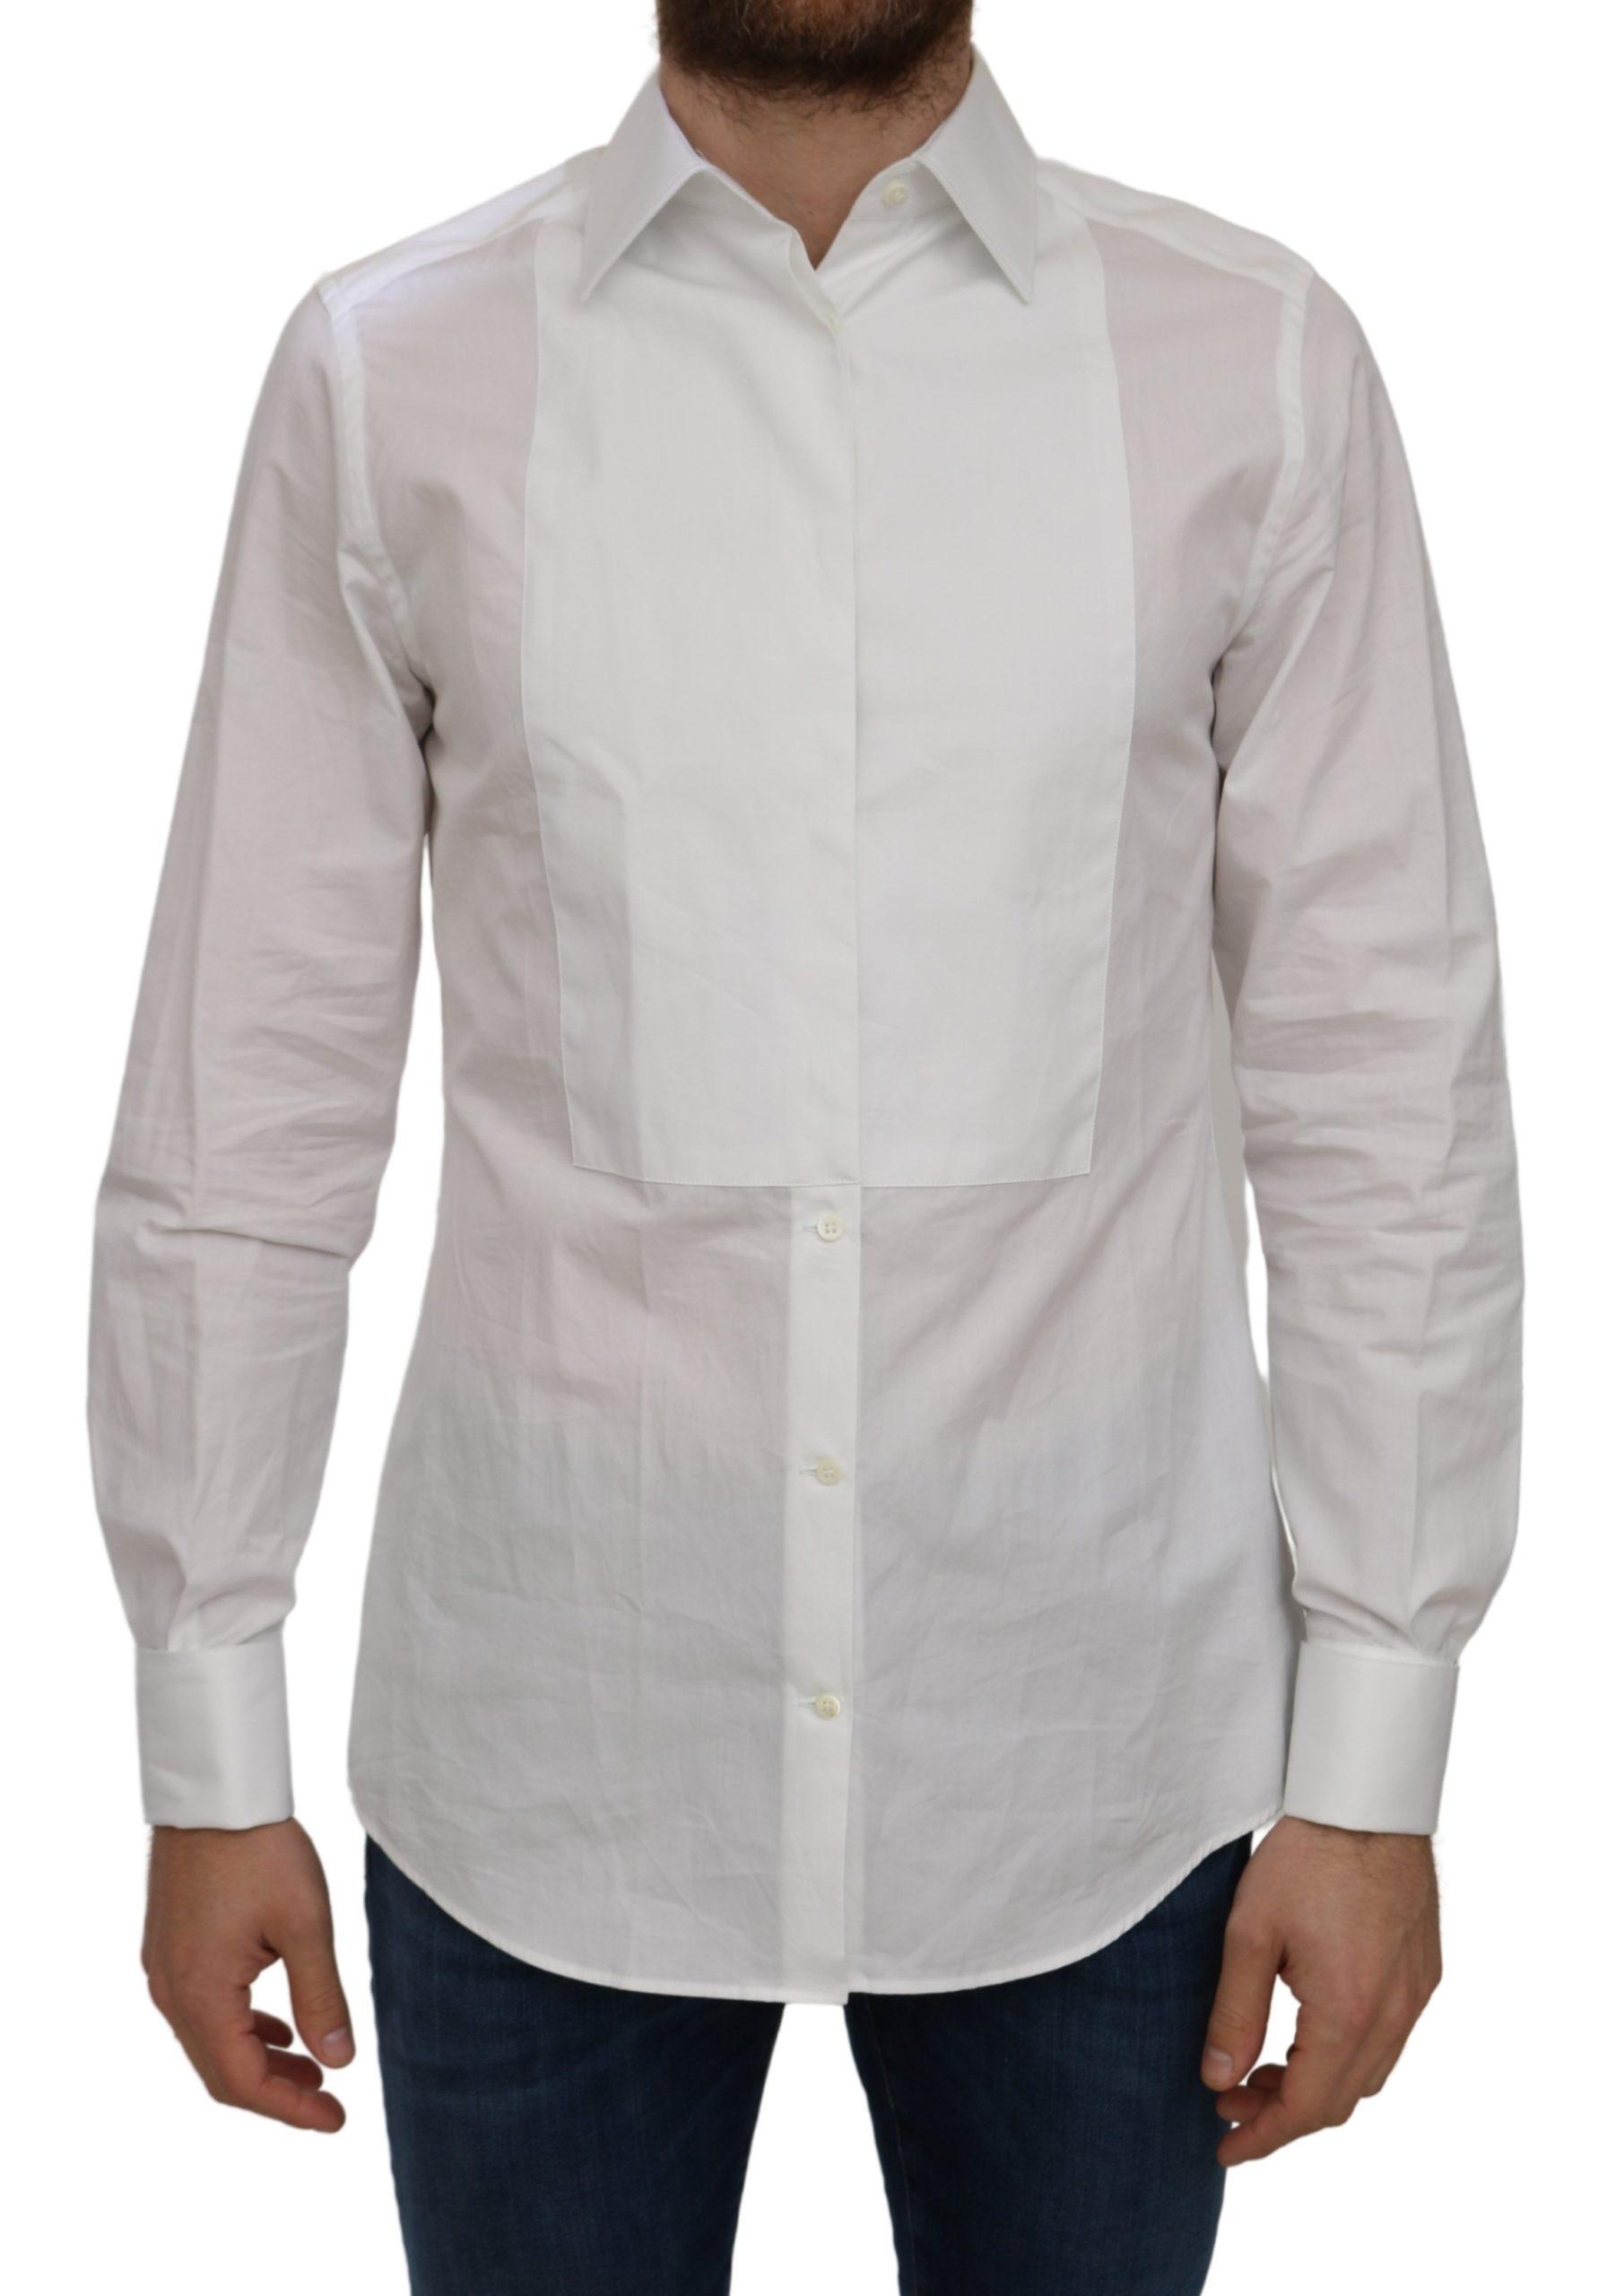 Dolce & Gabbana Men's Cotton Solid Shirt White TSH5028 - IT42   XL